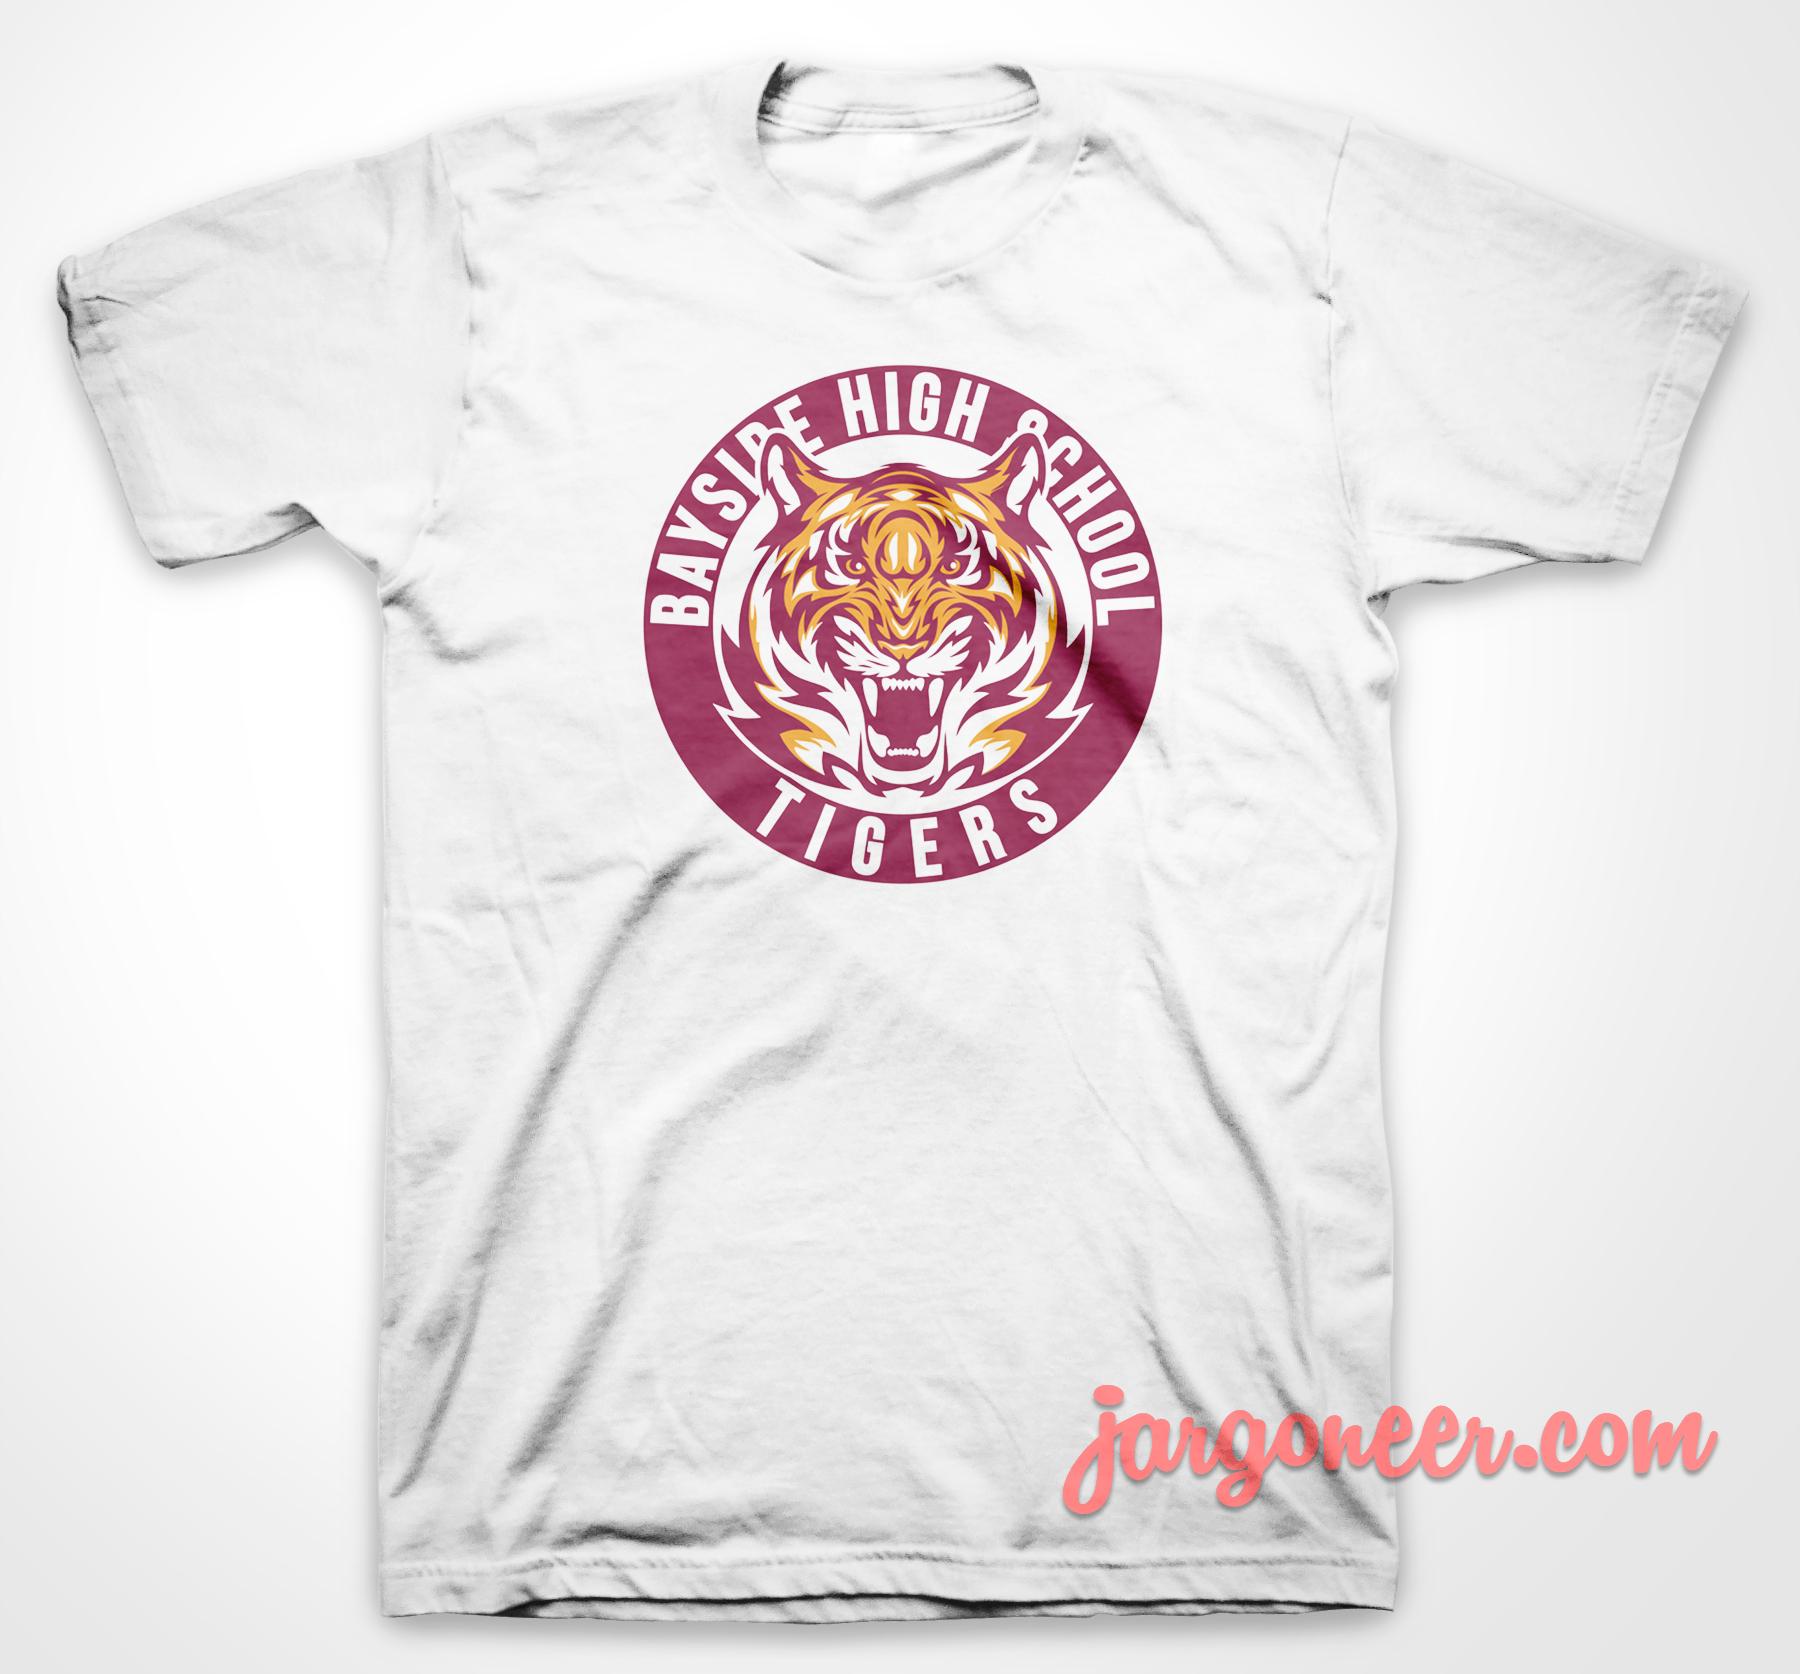 Bayside high school t shirt ideas t shirt shirt for High school t shirt design ideas